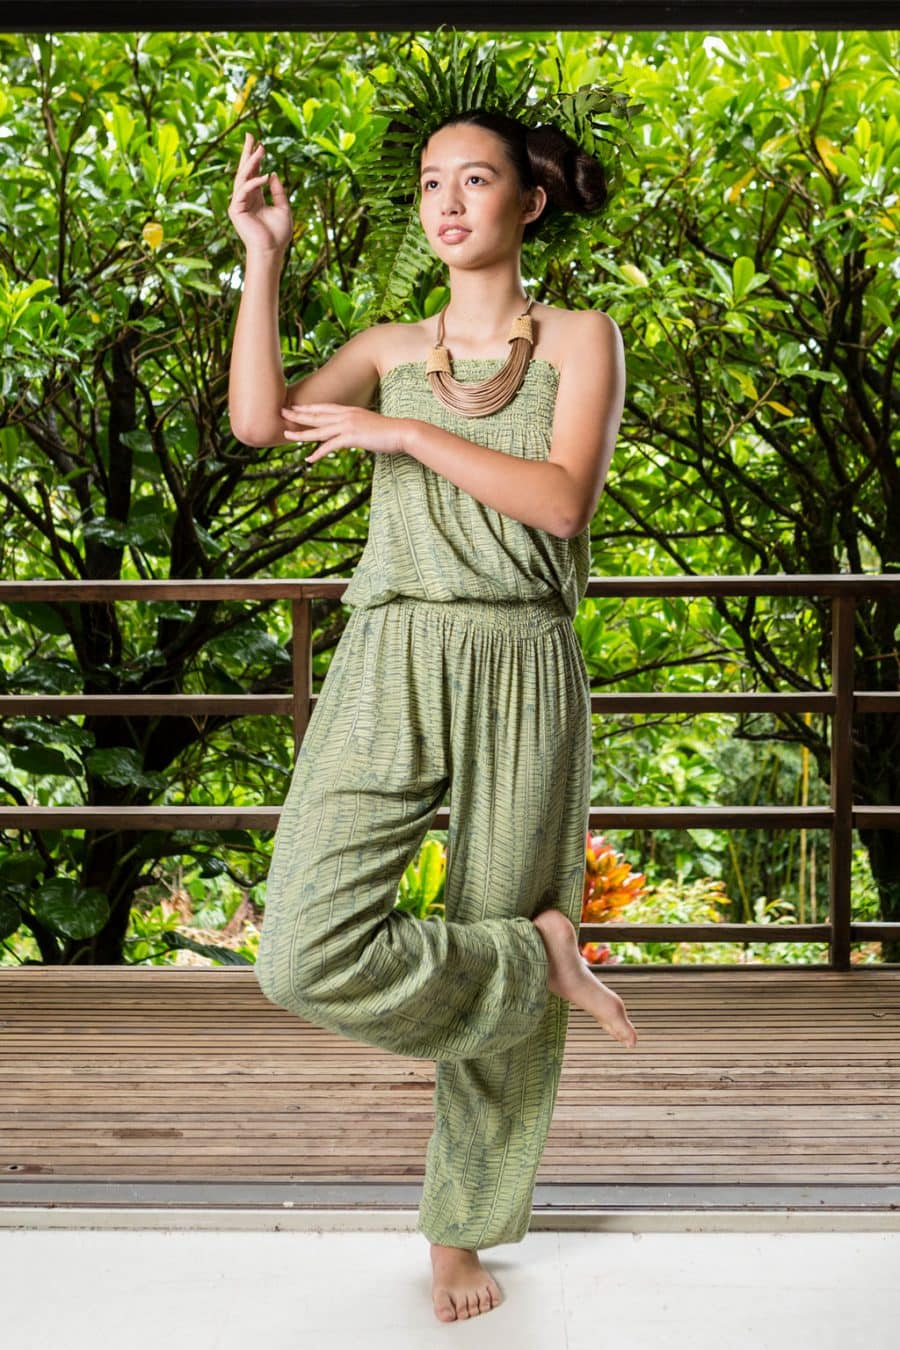 Model wearing Nanea Jumpsuit in Margarita Lily Pad Kupukupu front view